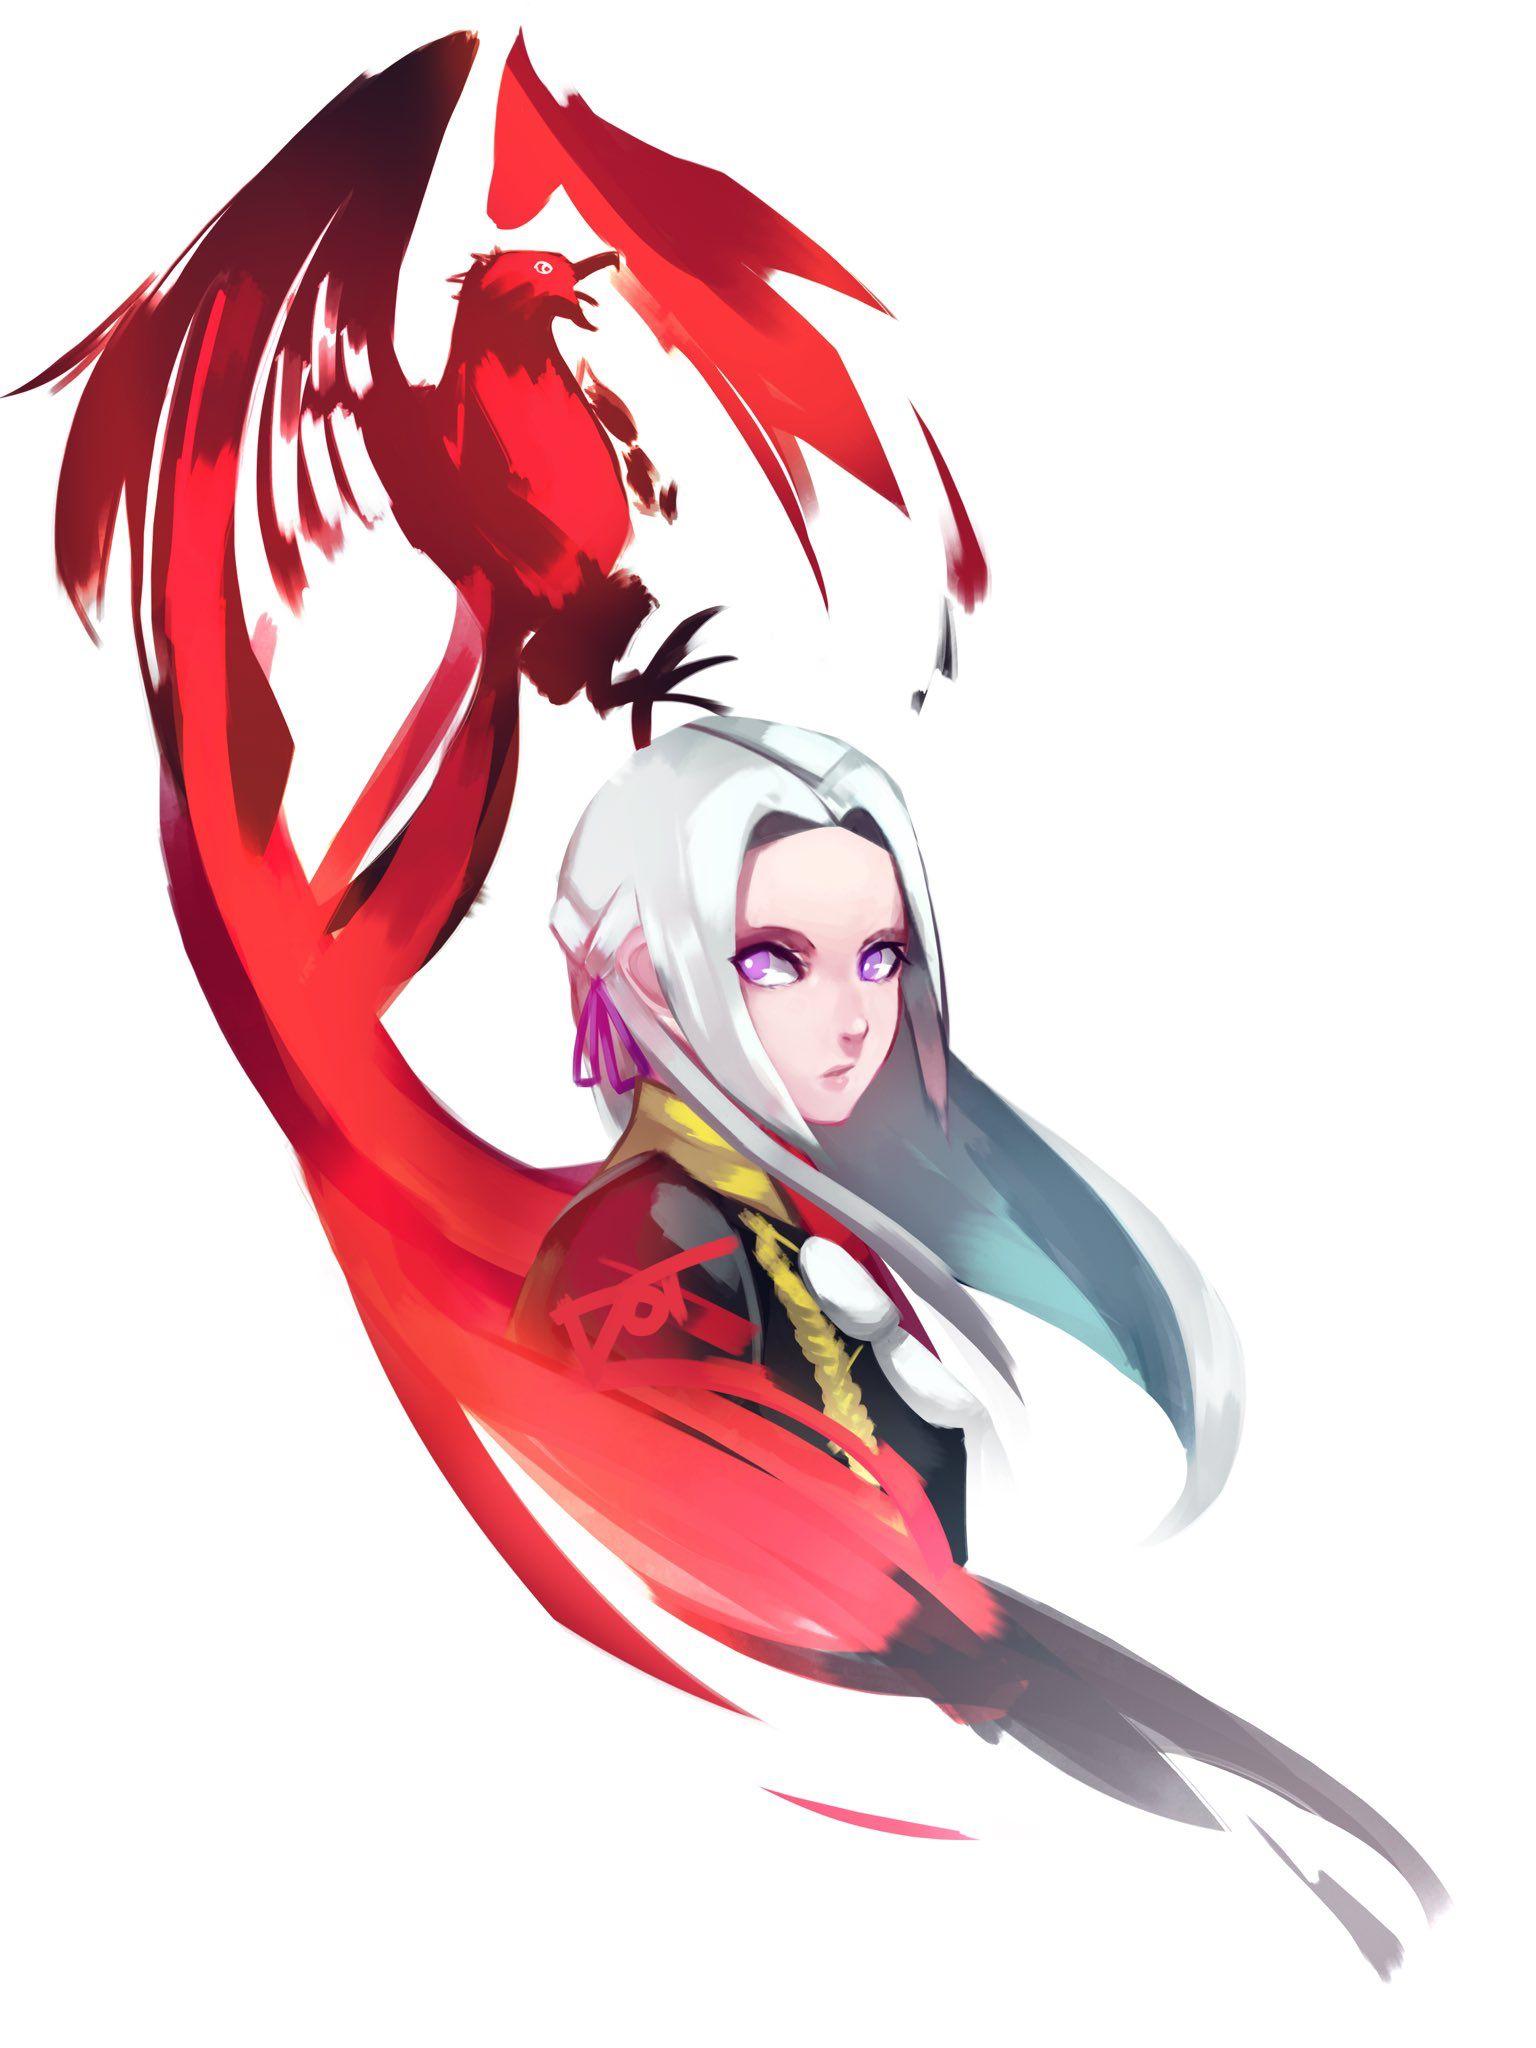 Edelgard Fire Emblem Characters Fire Emblem New Fire Emblem